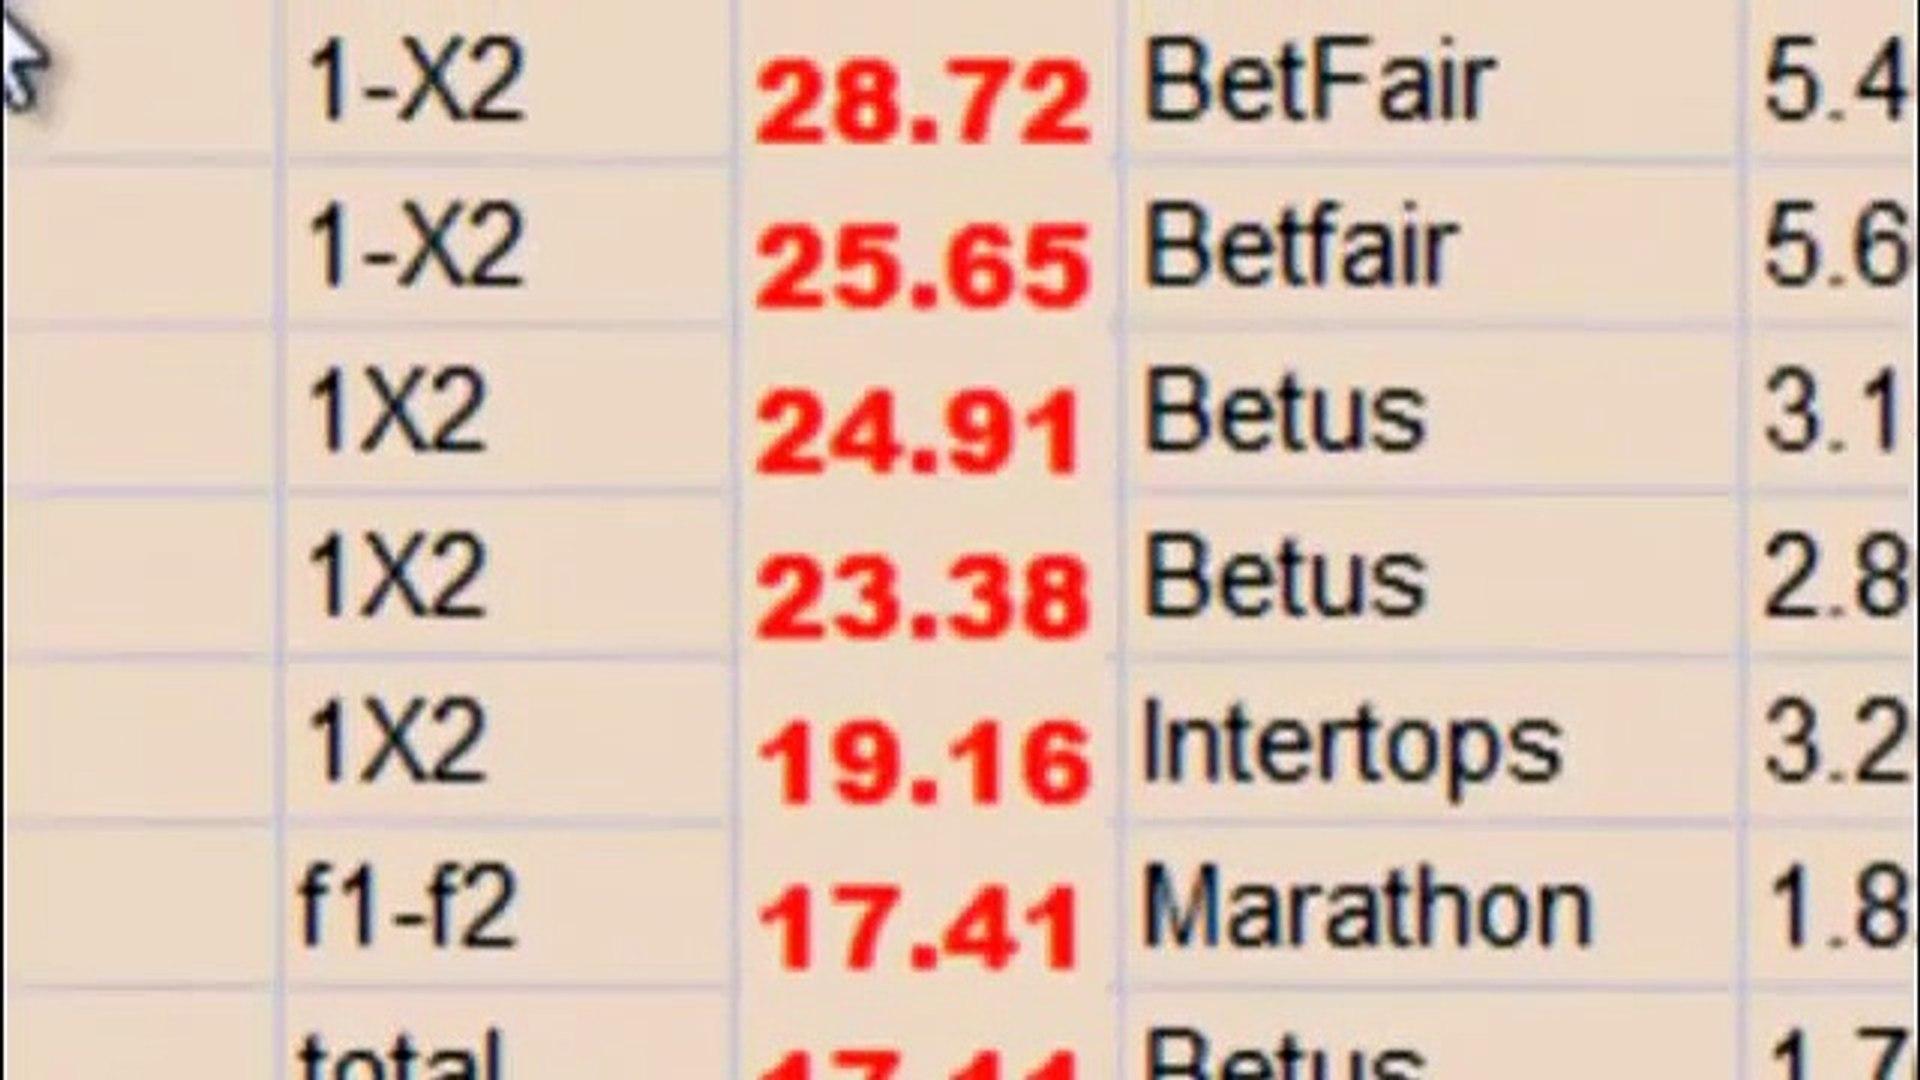 100 percent winners sports betting software downloads